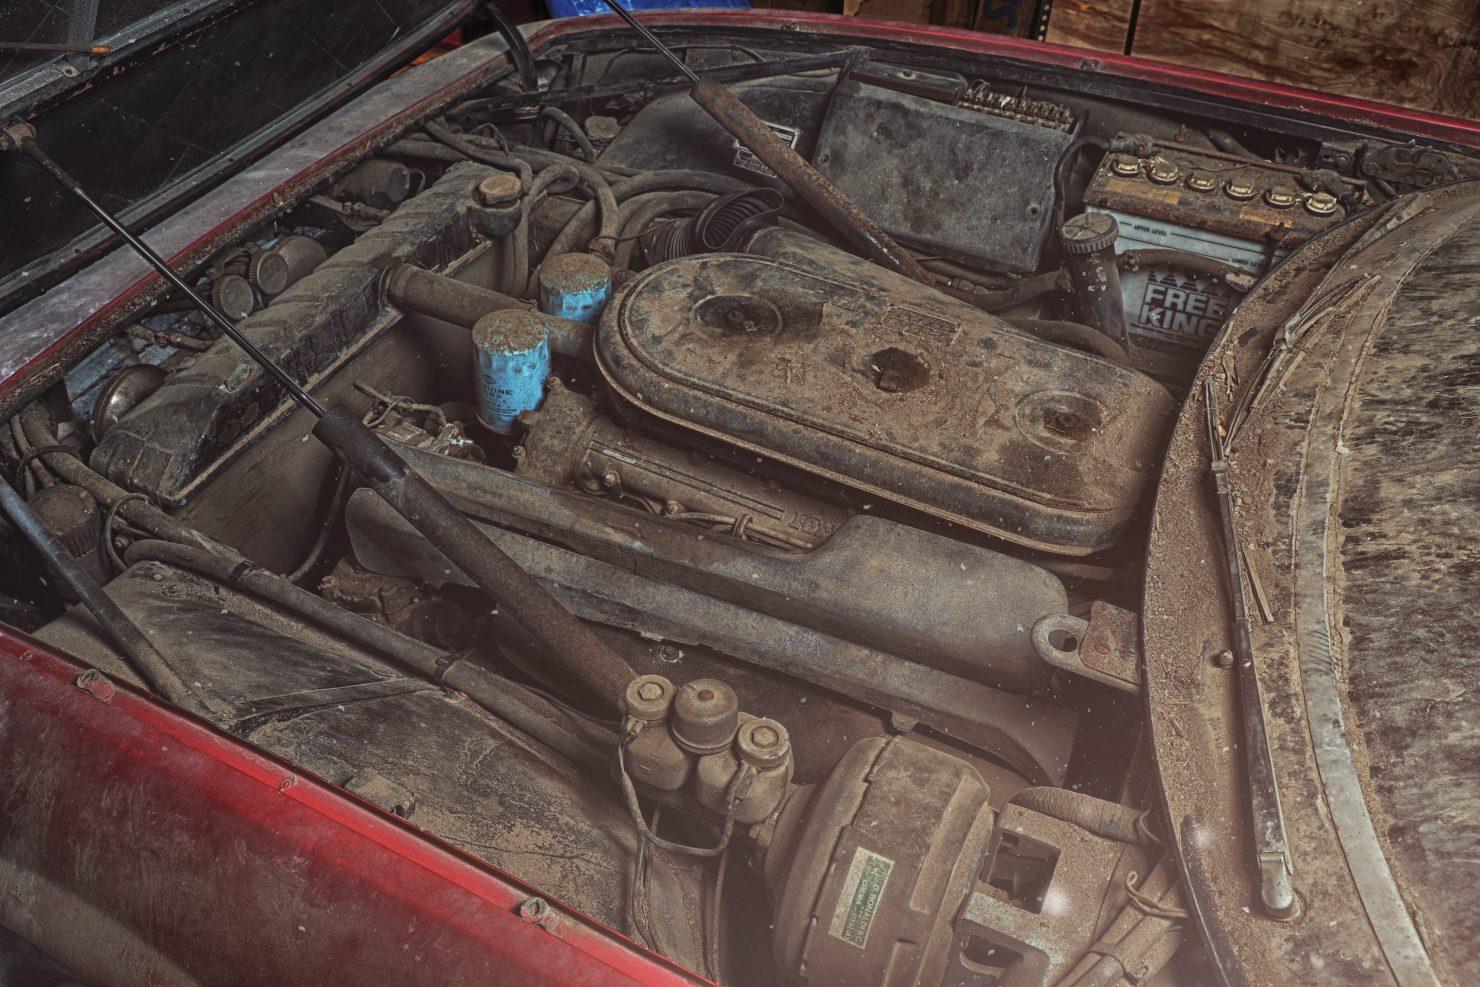 Ferrari 365 GTB4 Daytona Alloy 14 1480x987 - Barn Find: 1969 Ferrari 365 GTB/4 Daytona Alloy